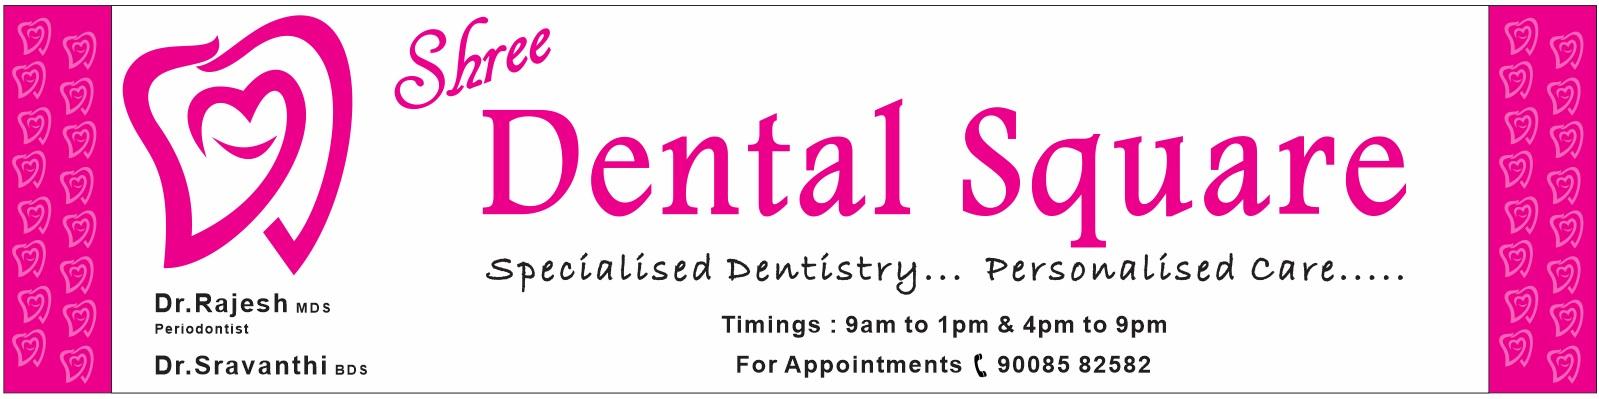 Shree Dental Square